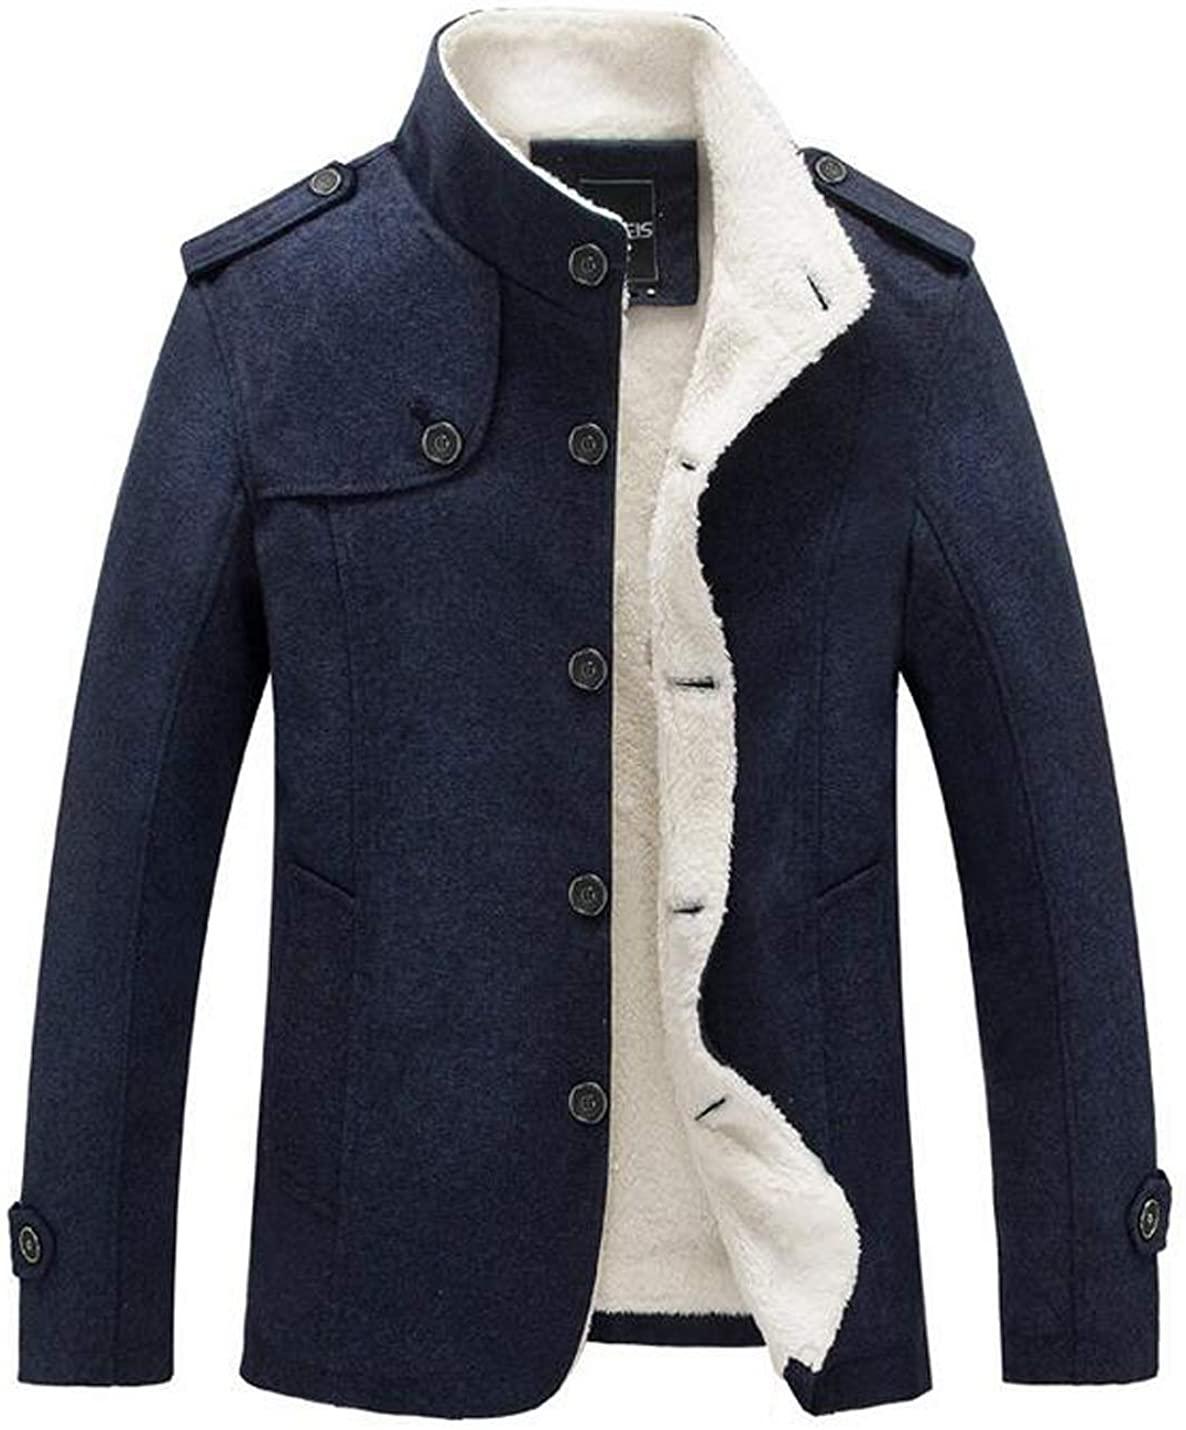 D.B.M Men's Slim Warm Stand Collar Buttons Non-Hooded Thicken Lamb Fleece Coat